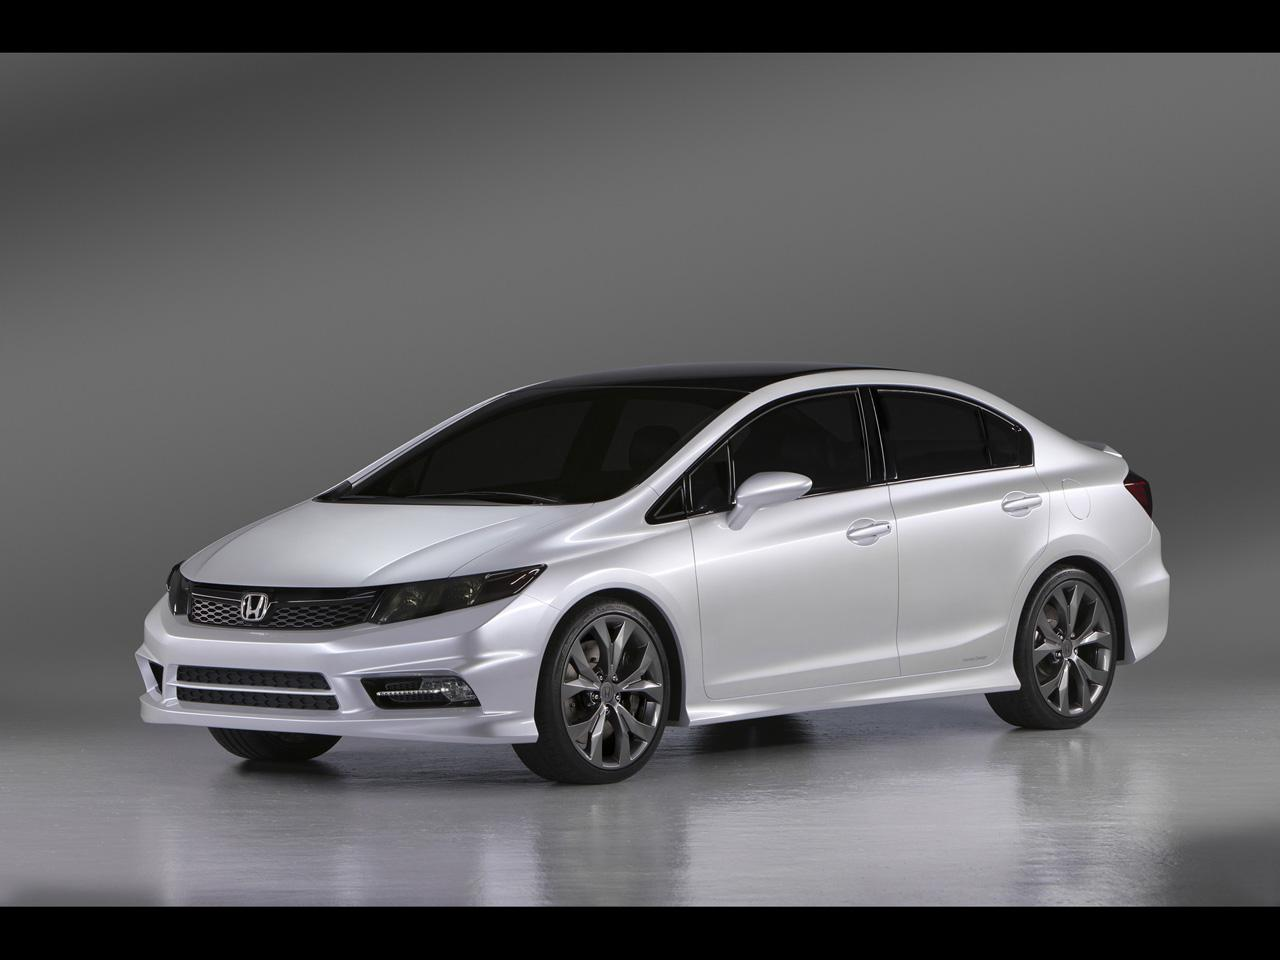 http://4.bp.blogspot.com/-nEFTSODpu0U/TWPbcg9N8MI/AAAAAAAAF3s/R0ygtf5D_PY/s1600/2011-Honda-Civic-Concept.jpg